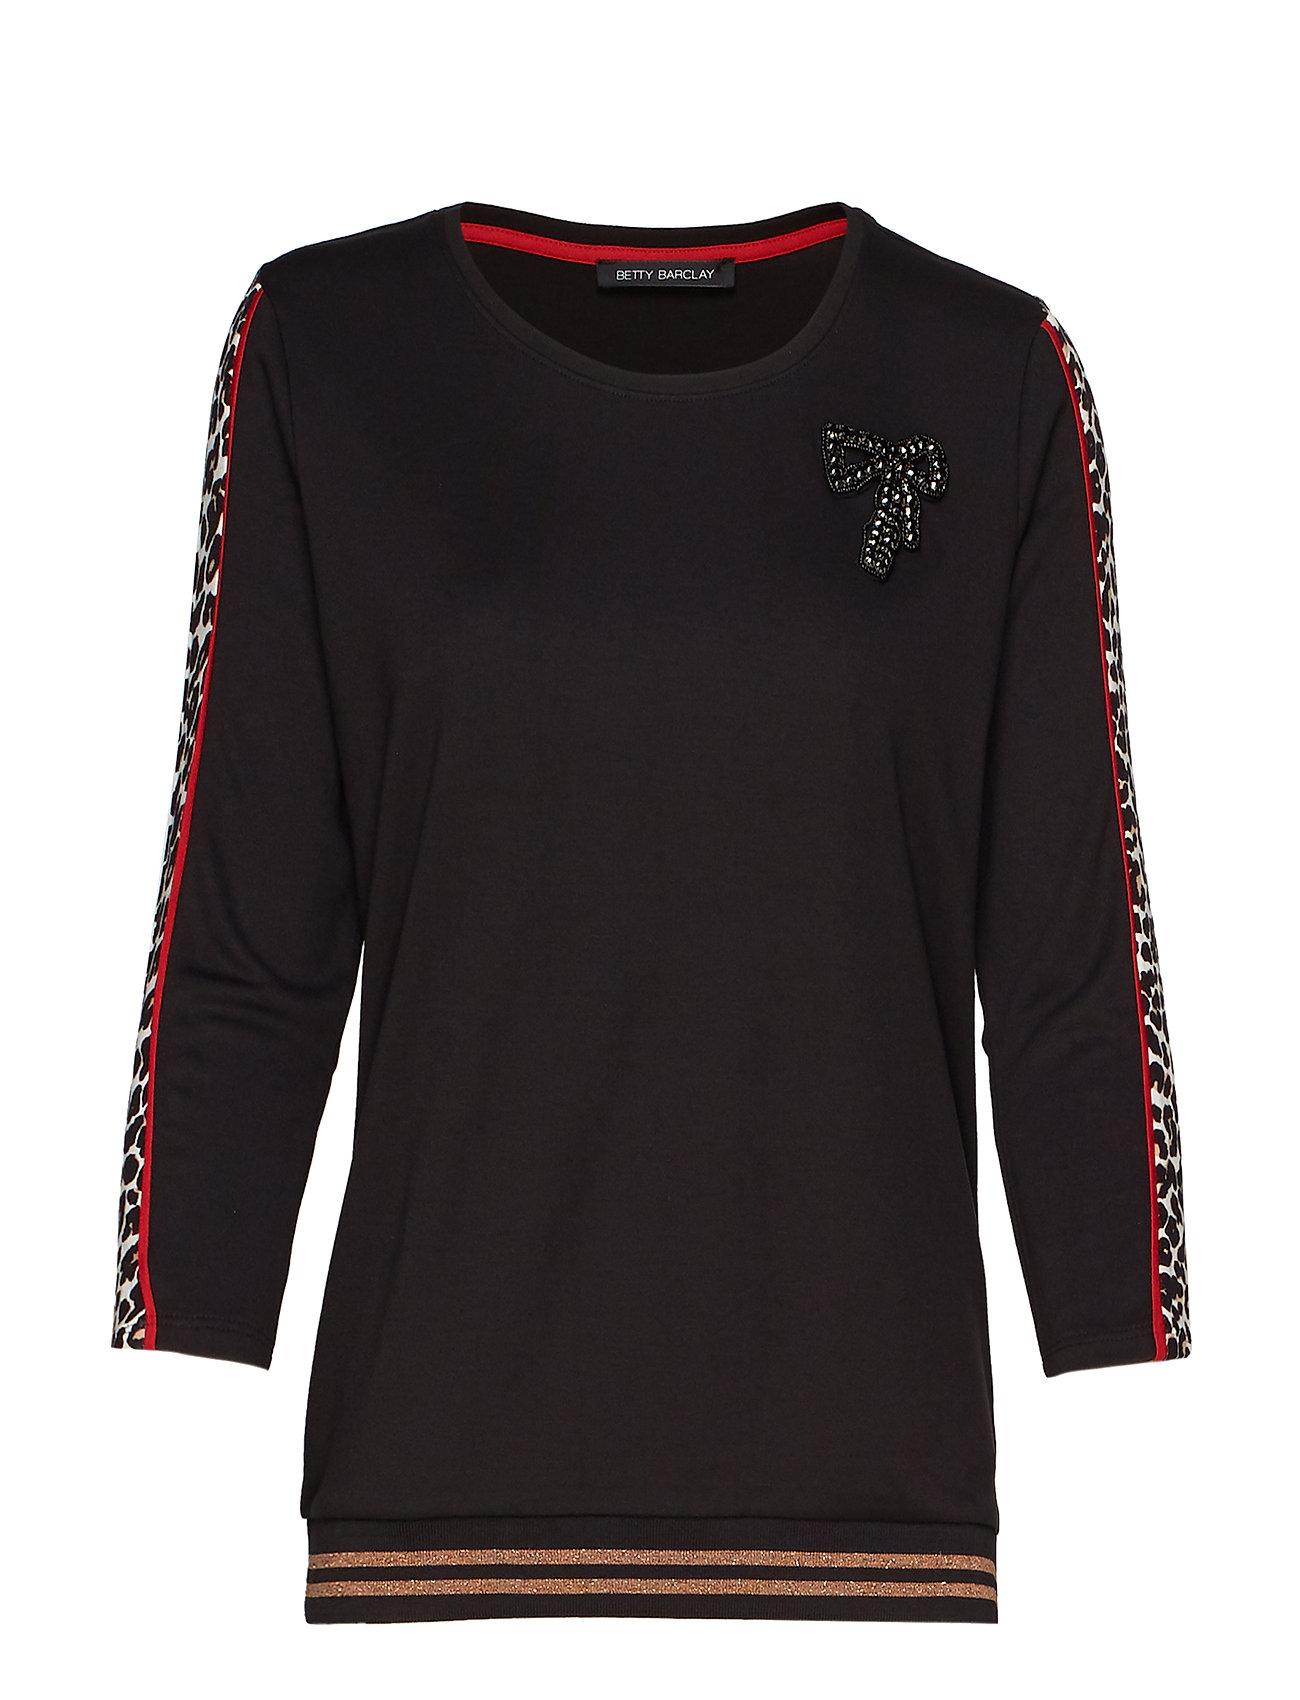 Betty Barclay Sweat Short 3/4 Sleeve - BLACK/CAMEL